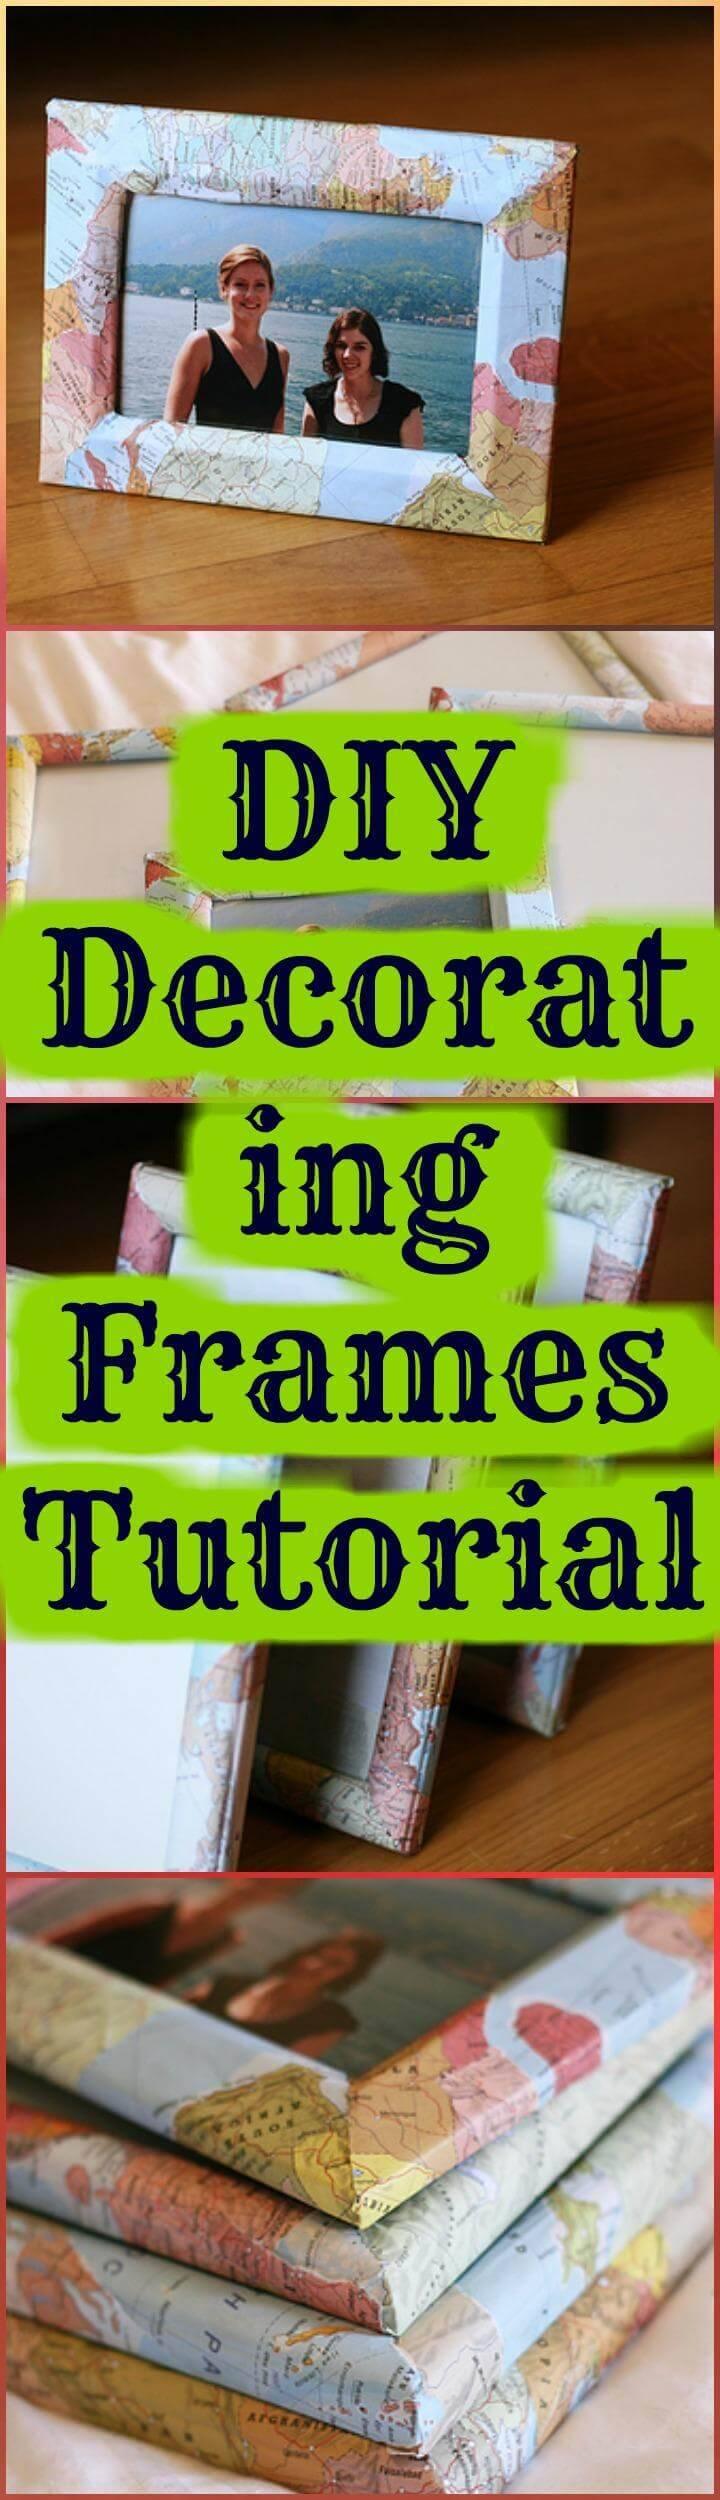 DIY decorating frames tutorial